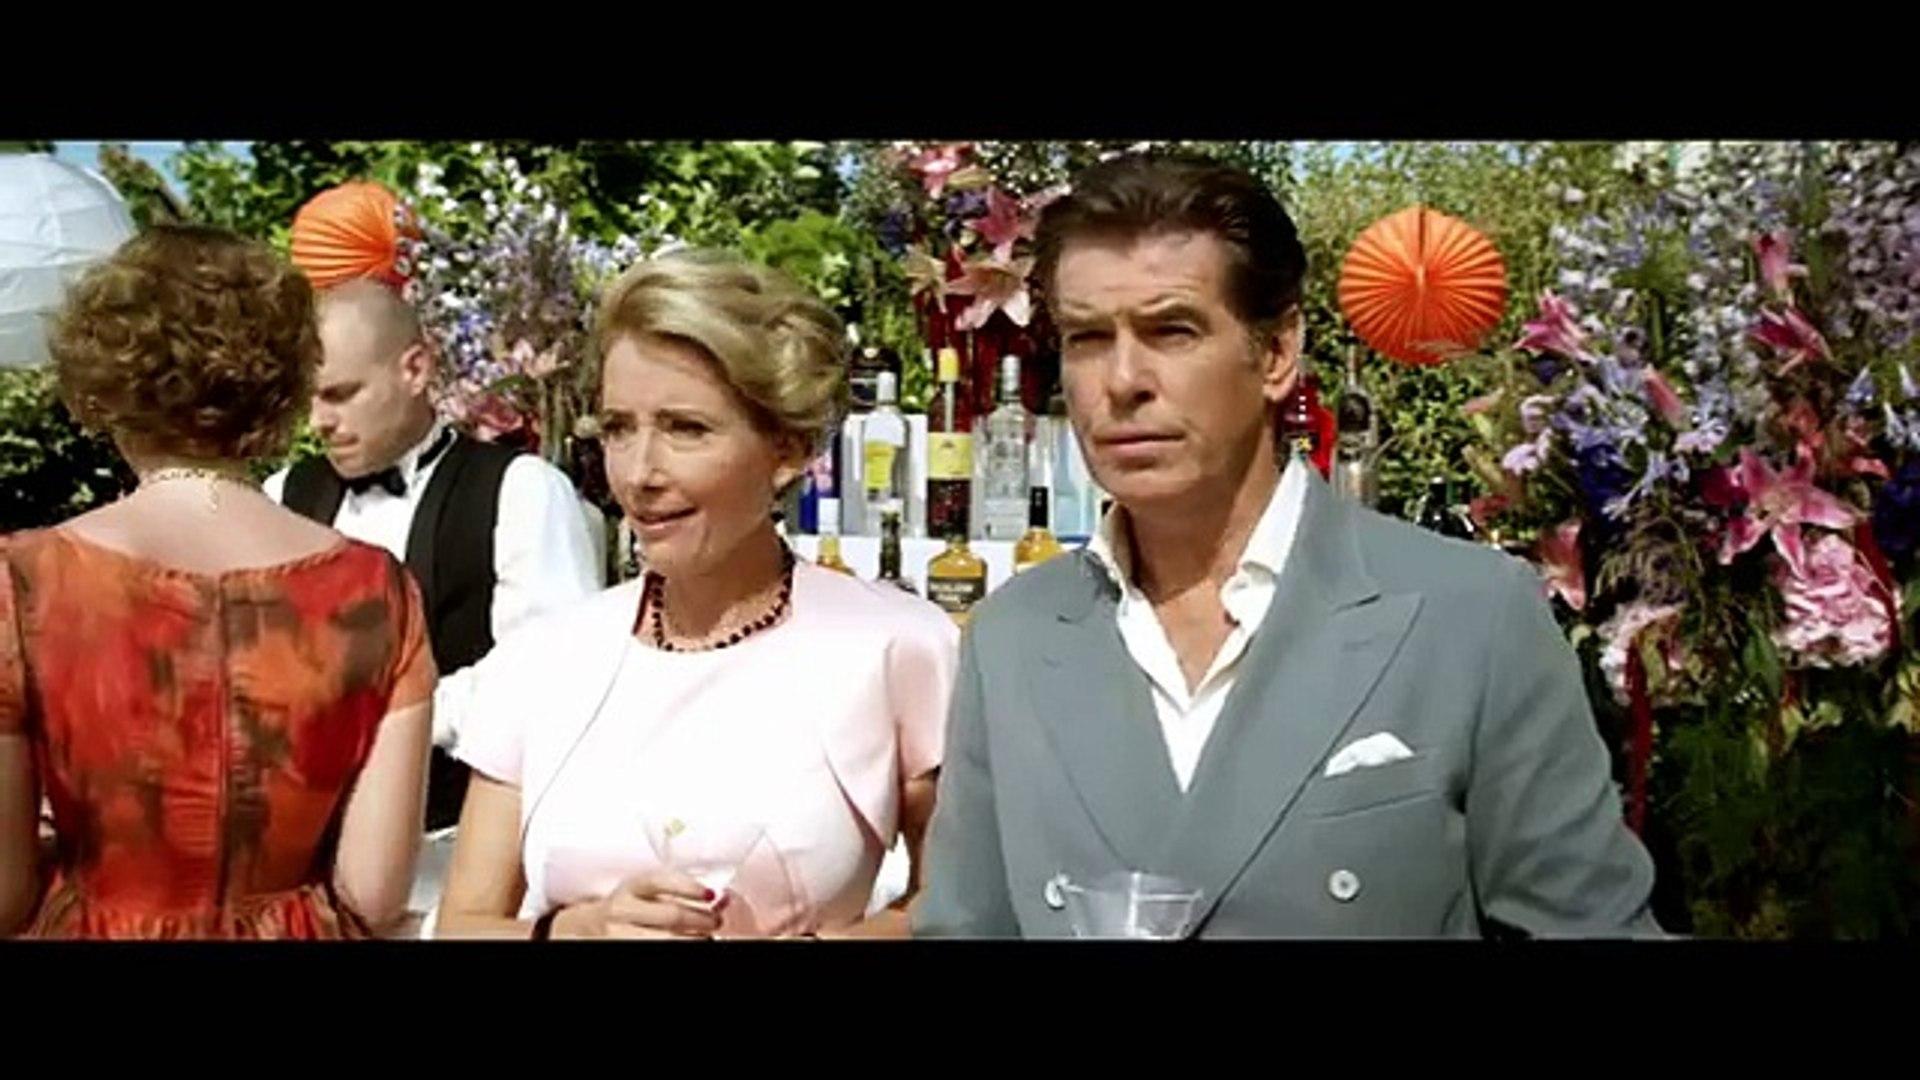 Full film izle - The Love Punch Fragman - basitfilmizle.com